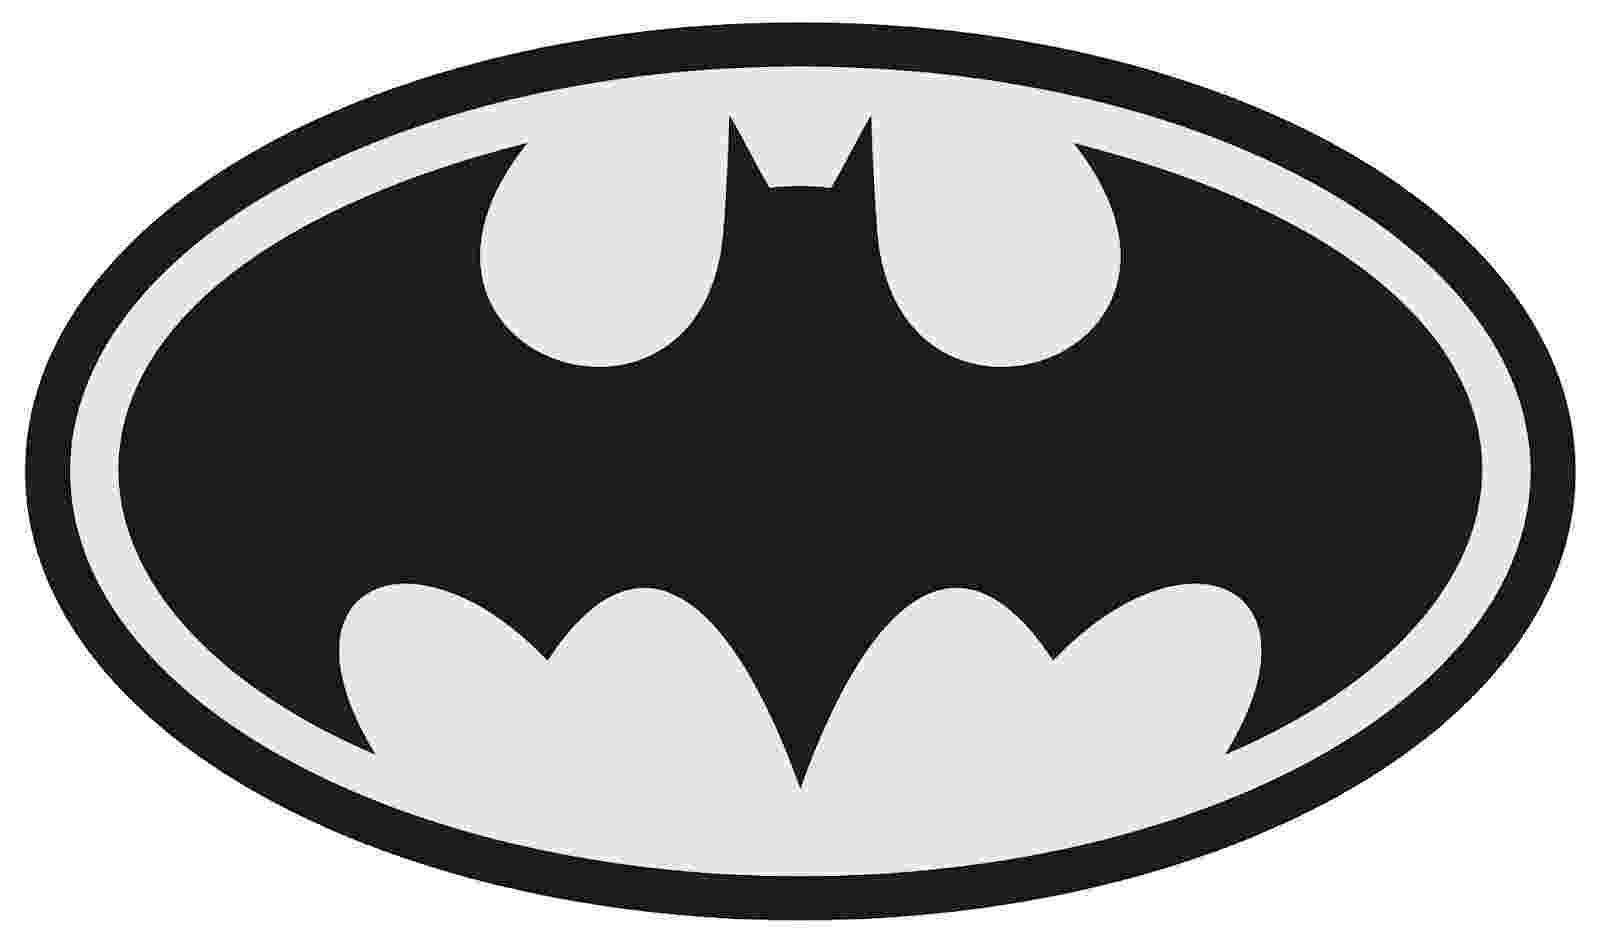 batman template batman template batman coloring pages printable batman template batman